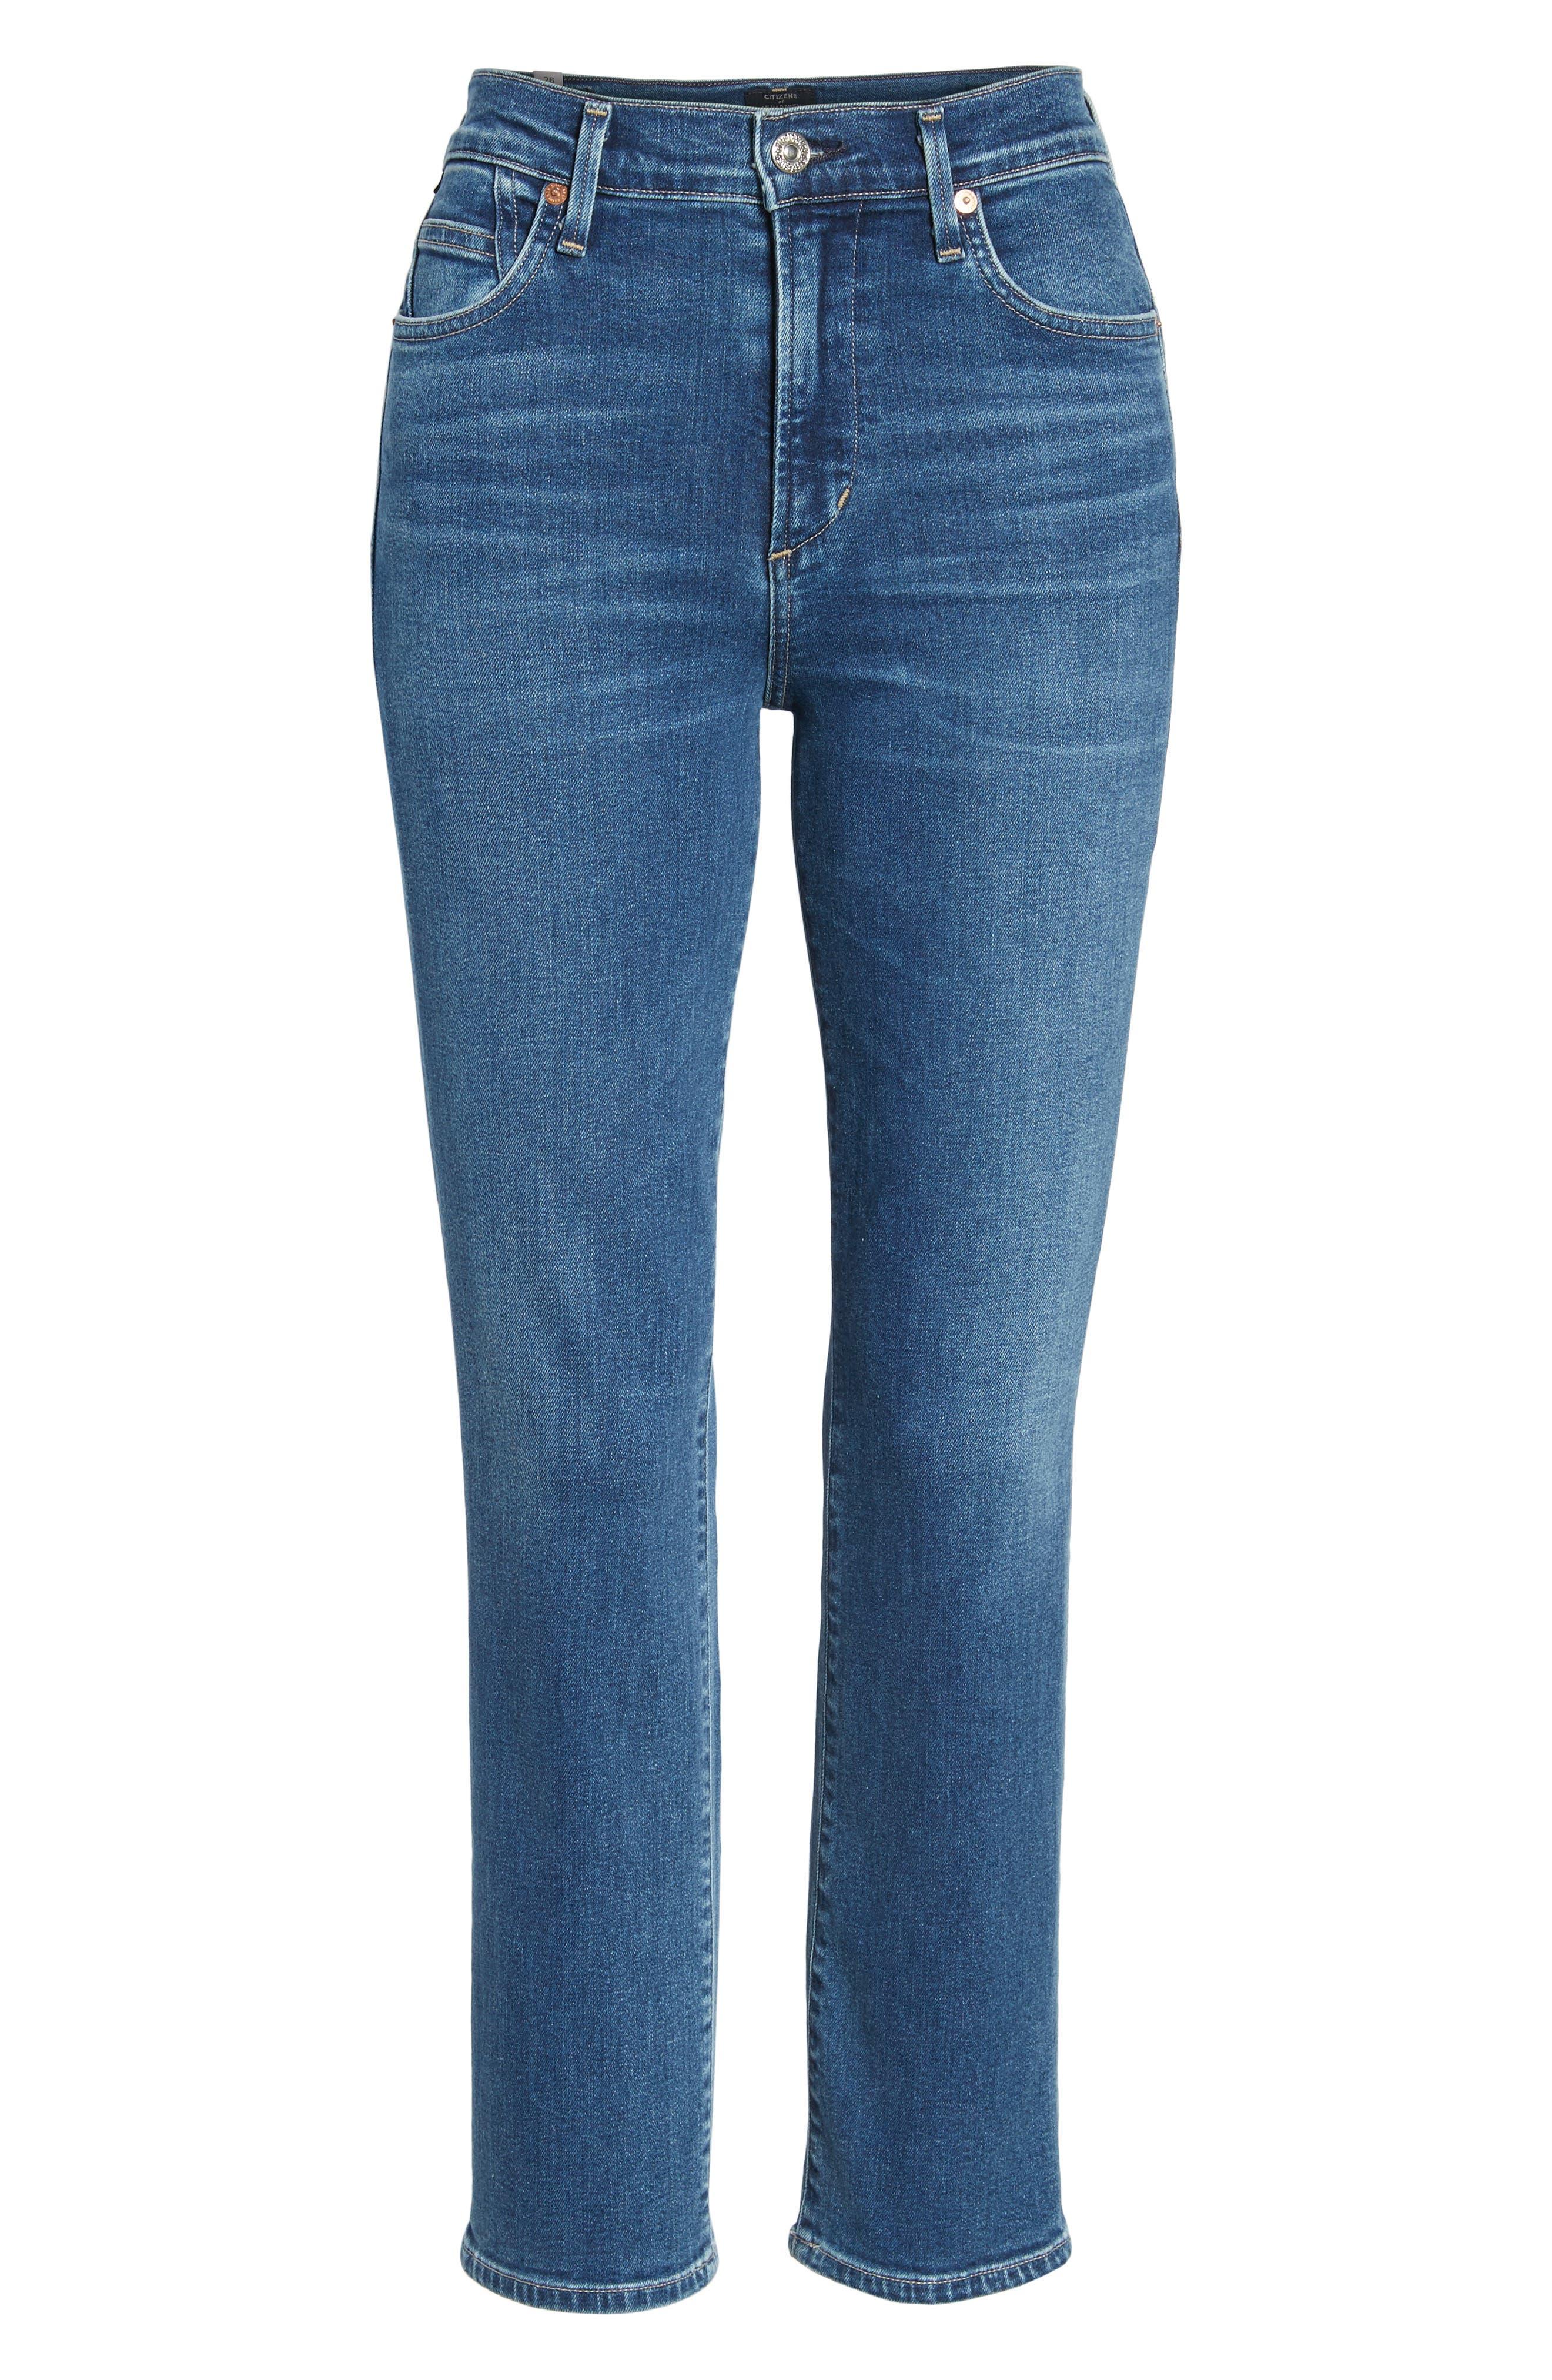 Cara Ankle Cigarette Jeans,                             Alternate thumbnail 7, color,